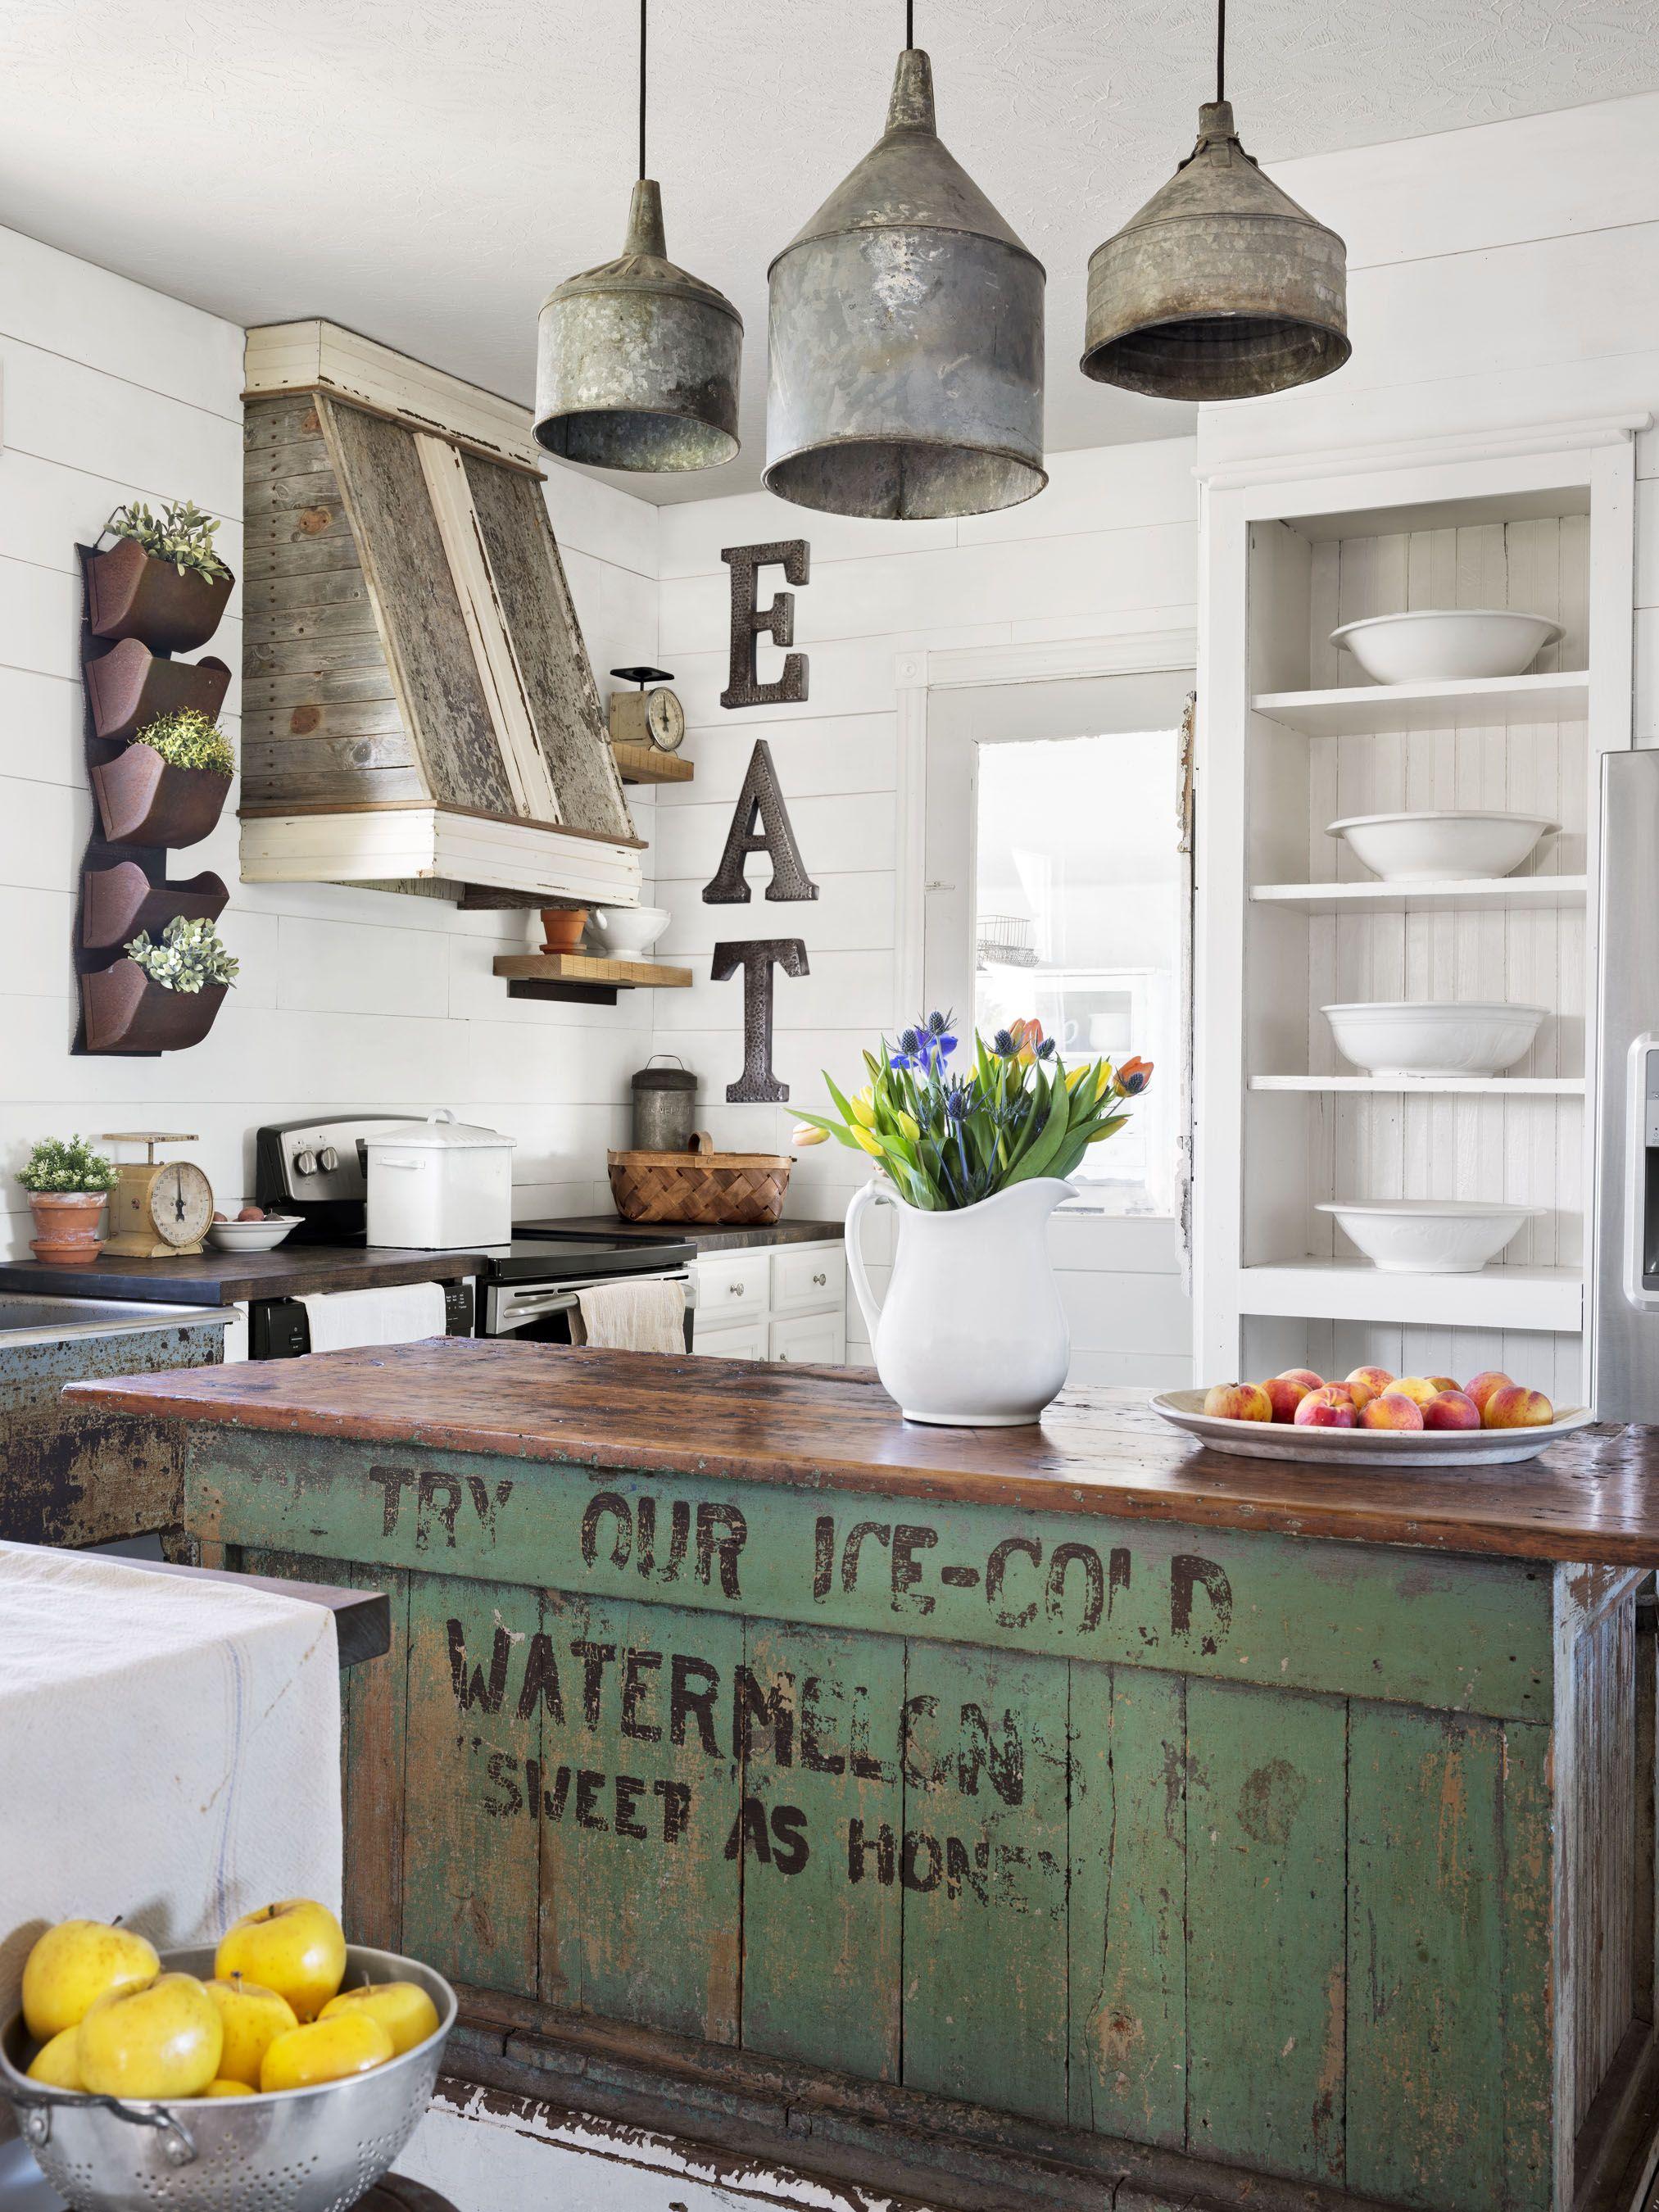 34 Farmhouse Style Kitchens - Rustic Decor Ideas for Kitchens on Farmhouse Rustic Kitchen Ideas  id=24096